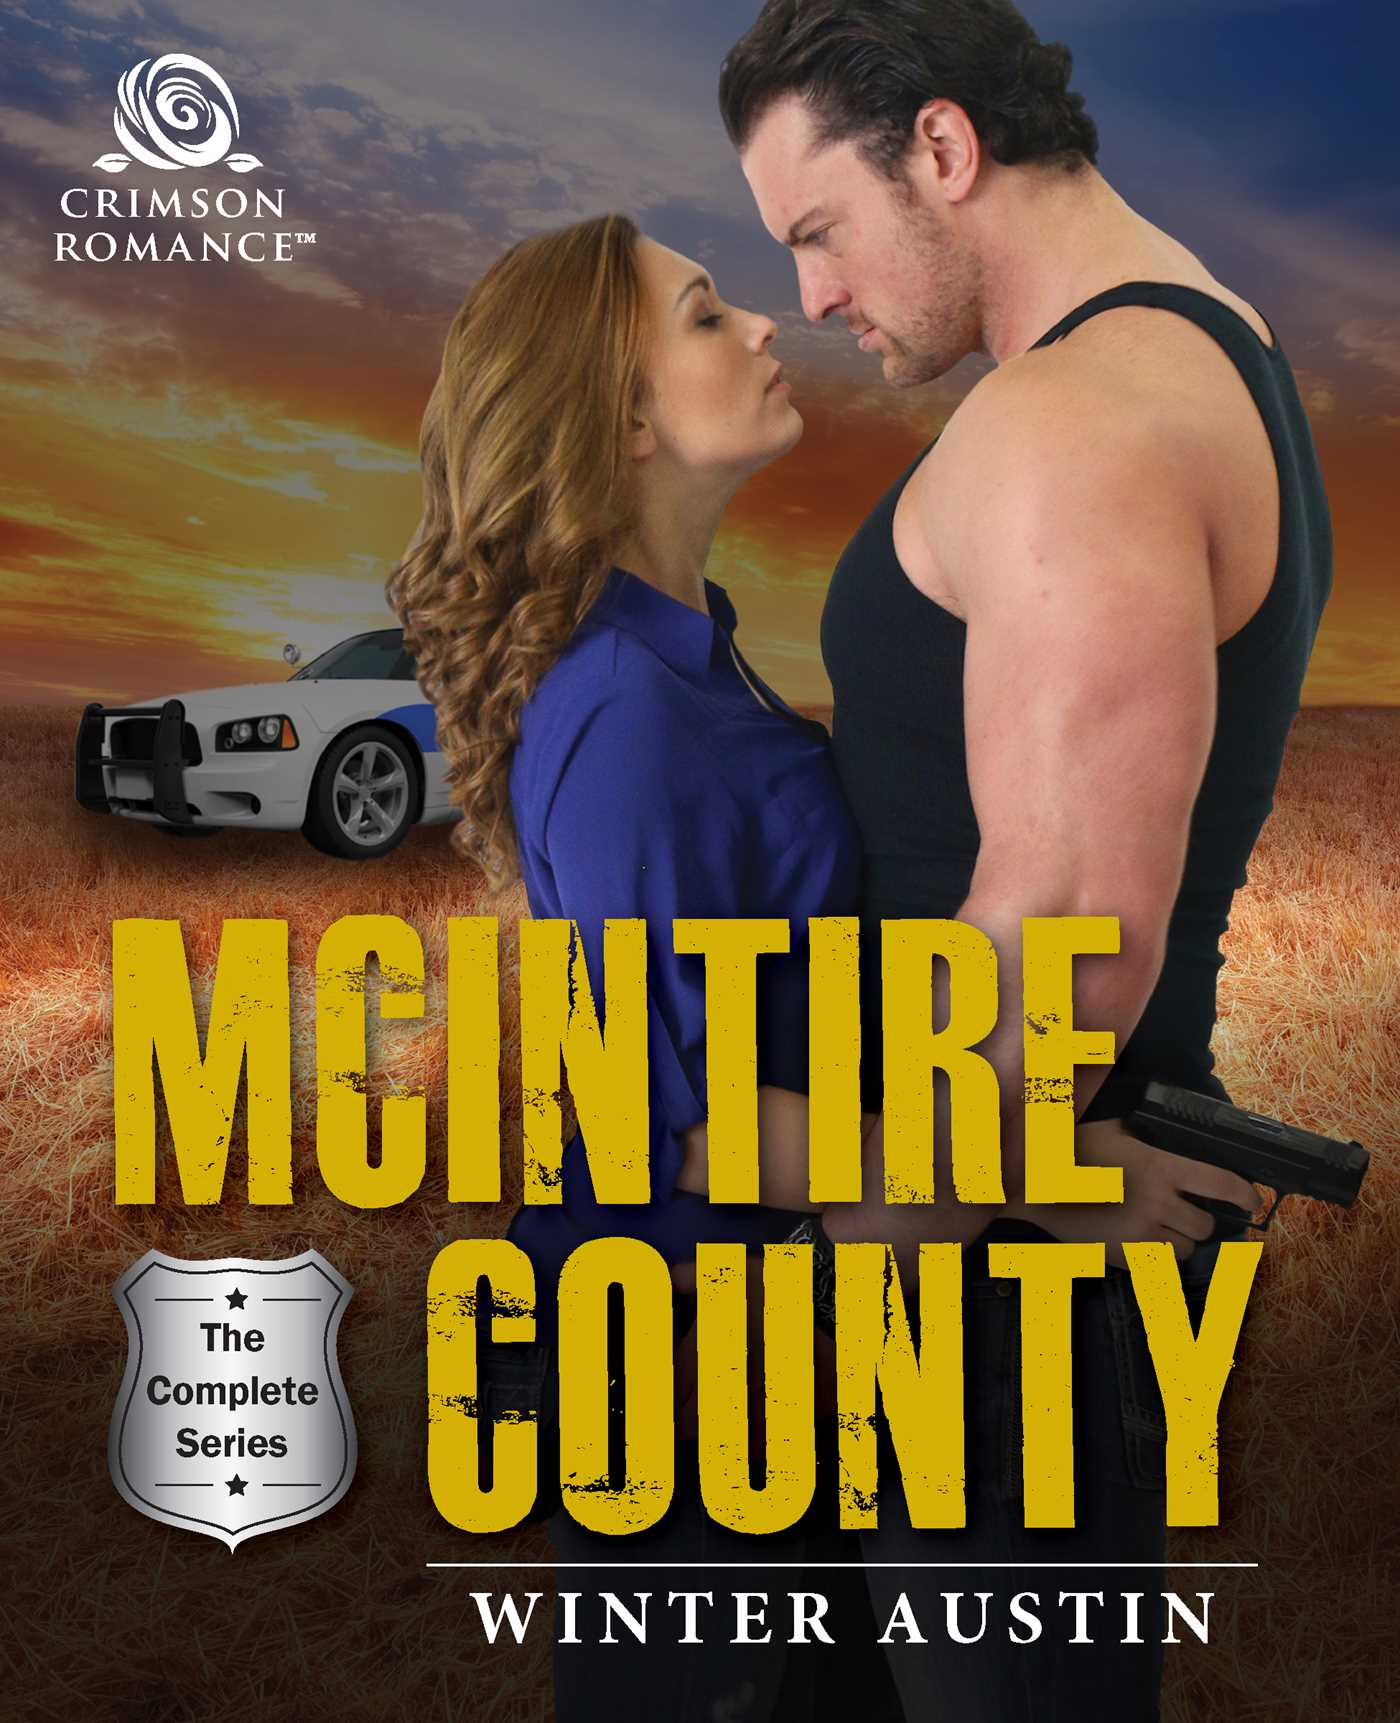 Mcintire county 9781507208434 hr